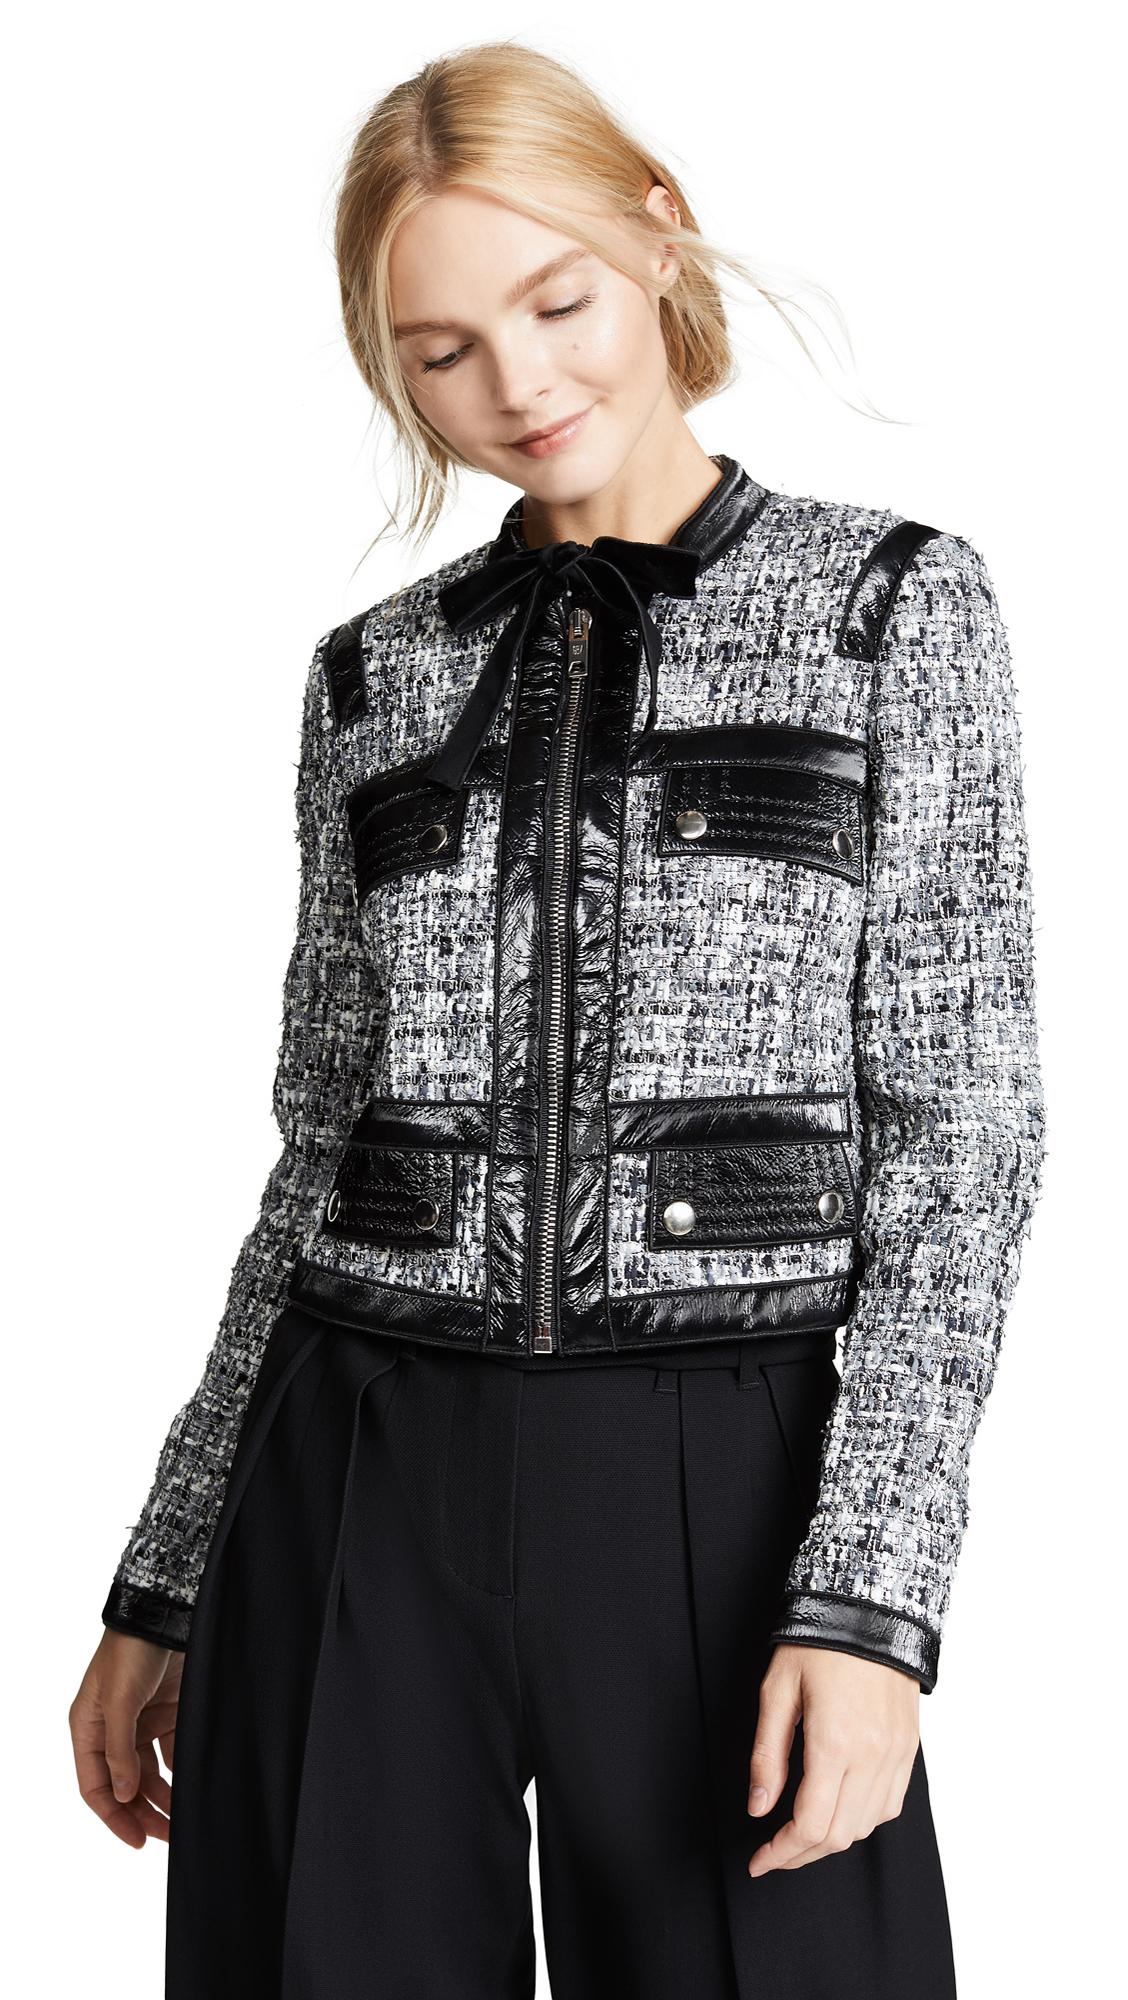 Giambattista Valli Leather Combo Tweed Jacket